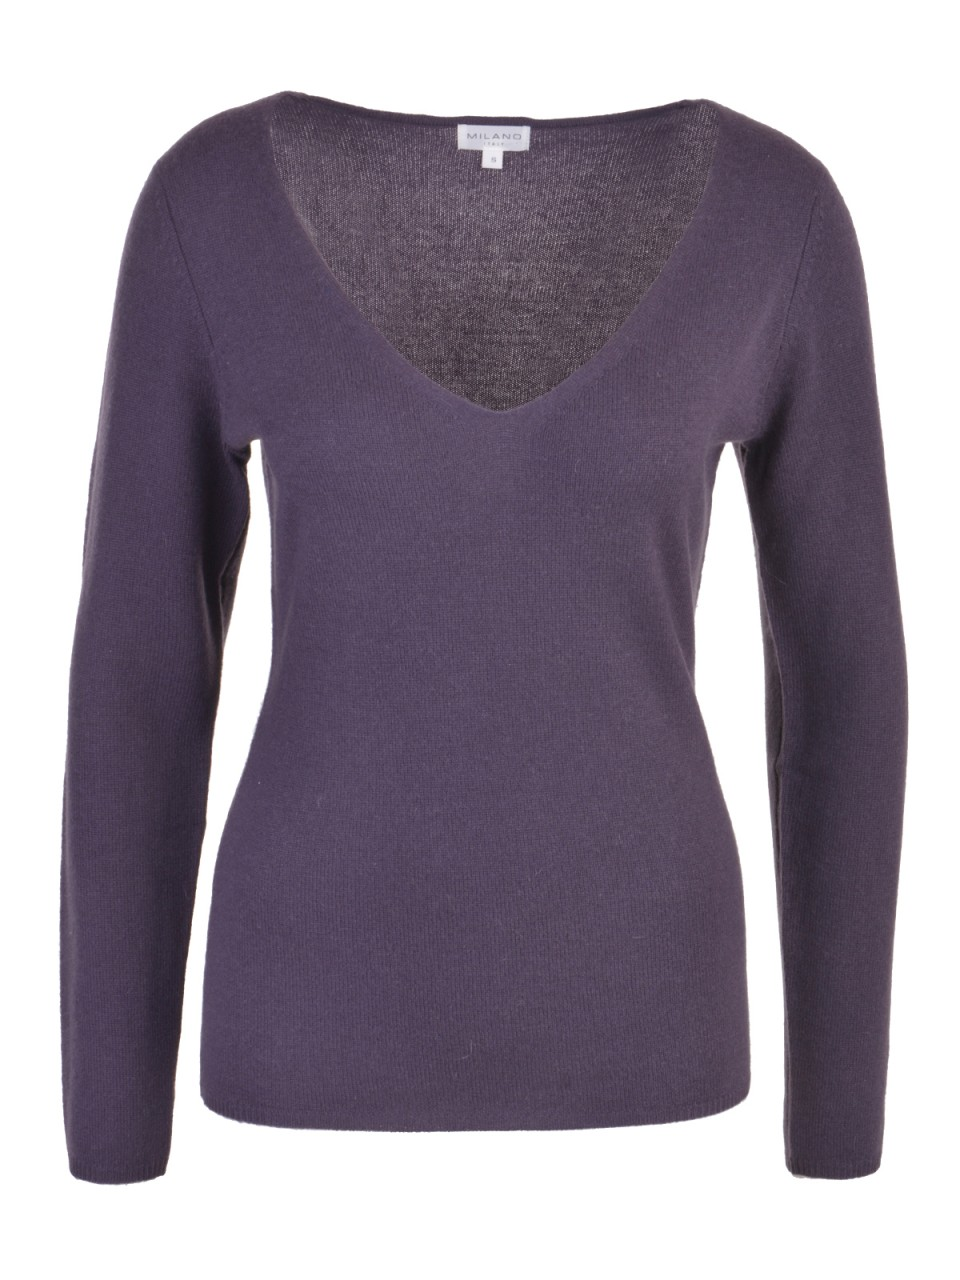 milano-italy-damen-kaschmir-pullover-braun